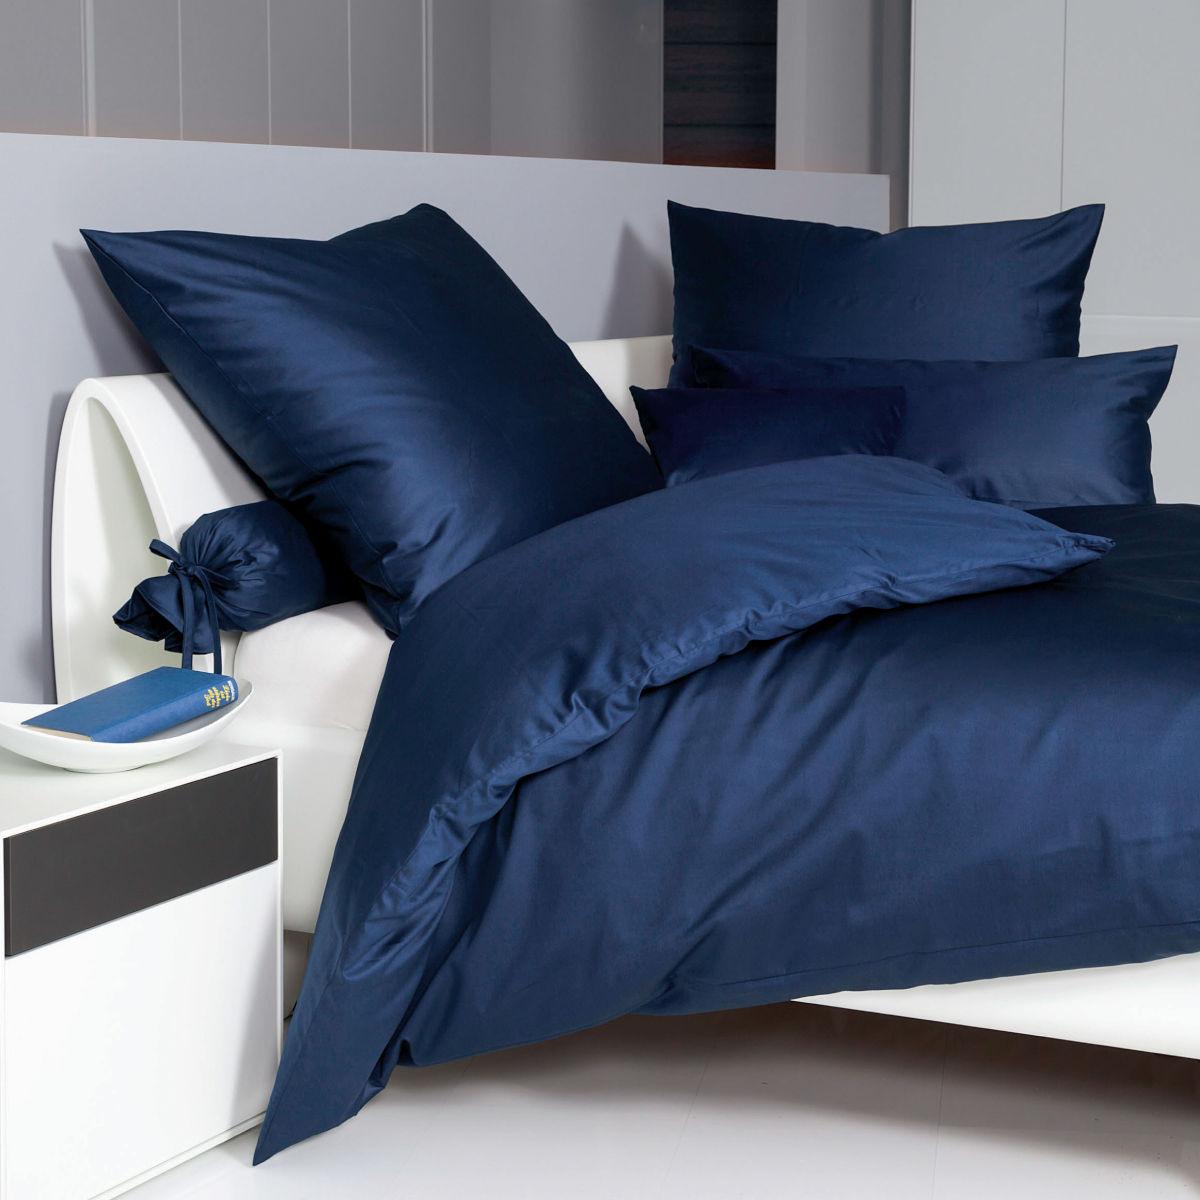 janine uni mako satin bettw sche programm colors design 31001 kissenbezug ebay. Black Bedroom Furniture Sets. Home Design Ideas